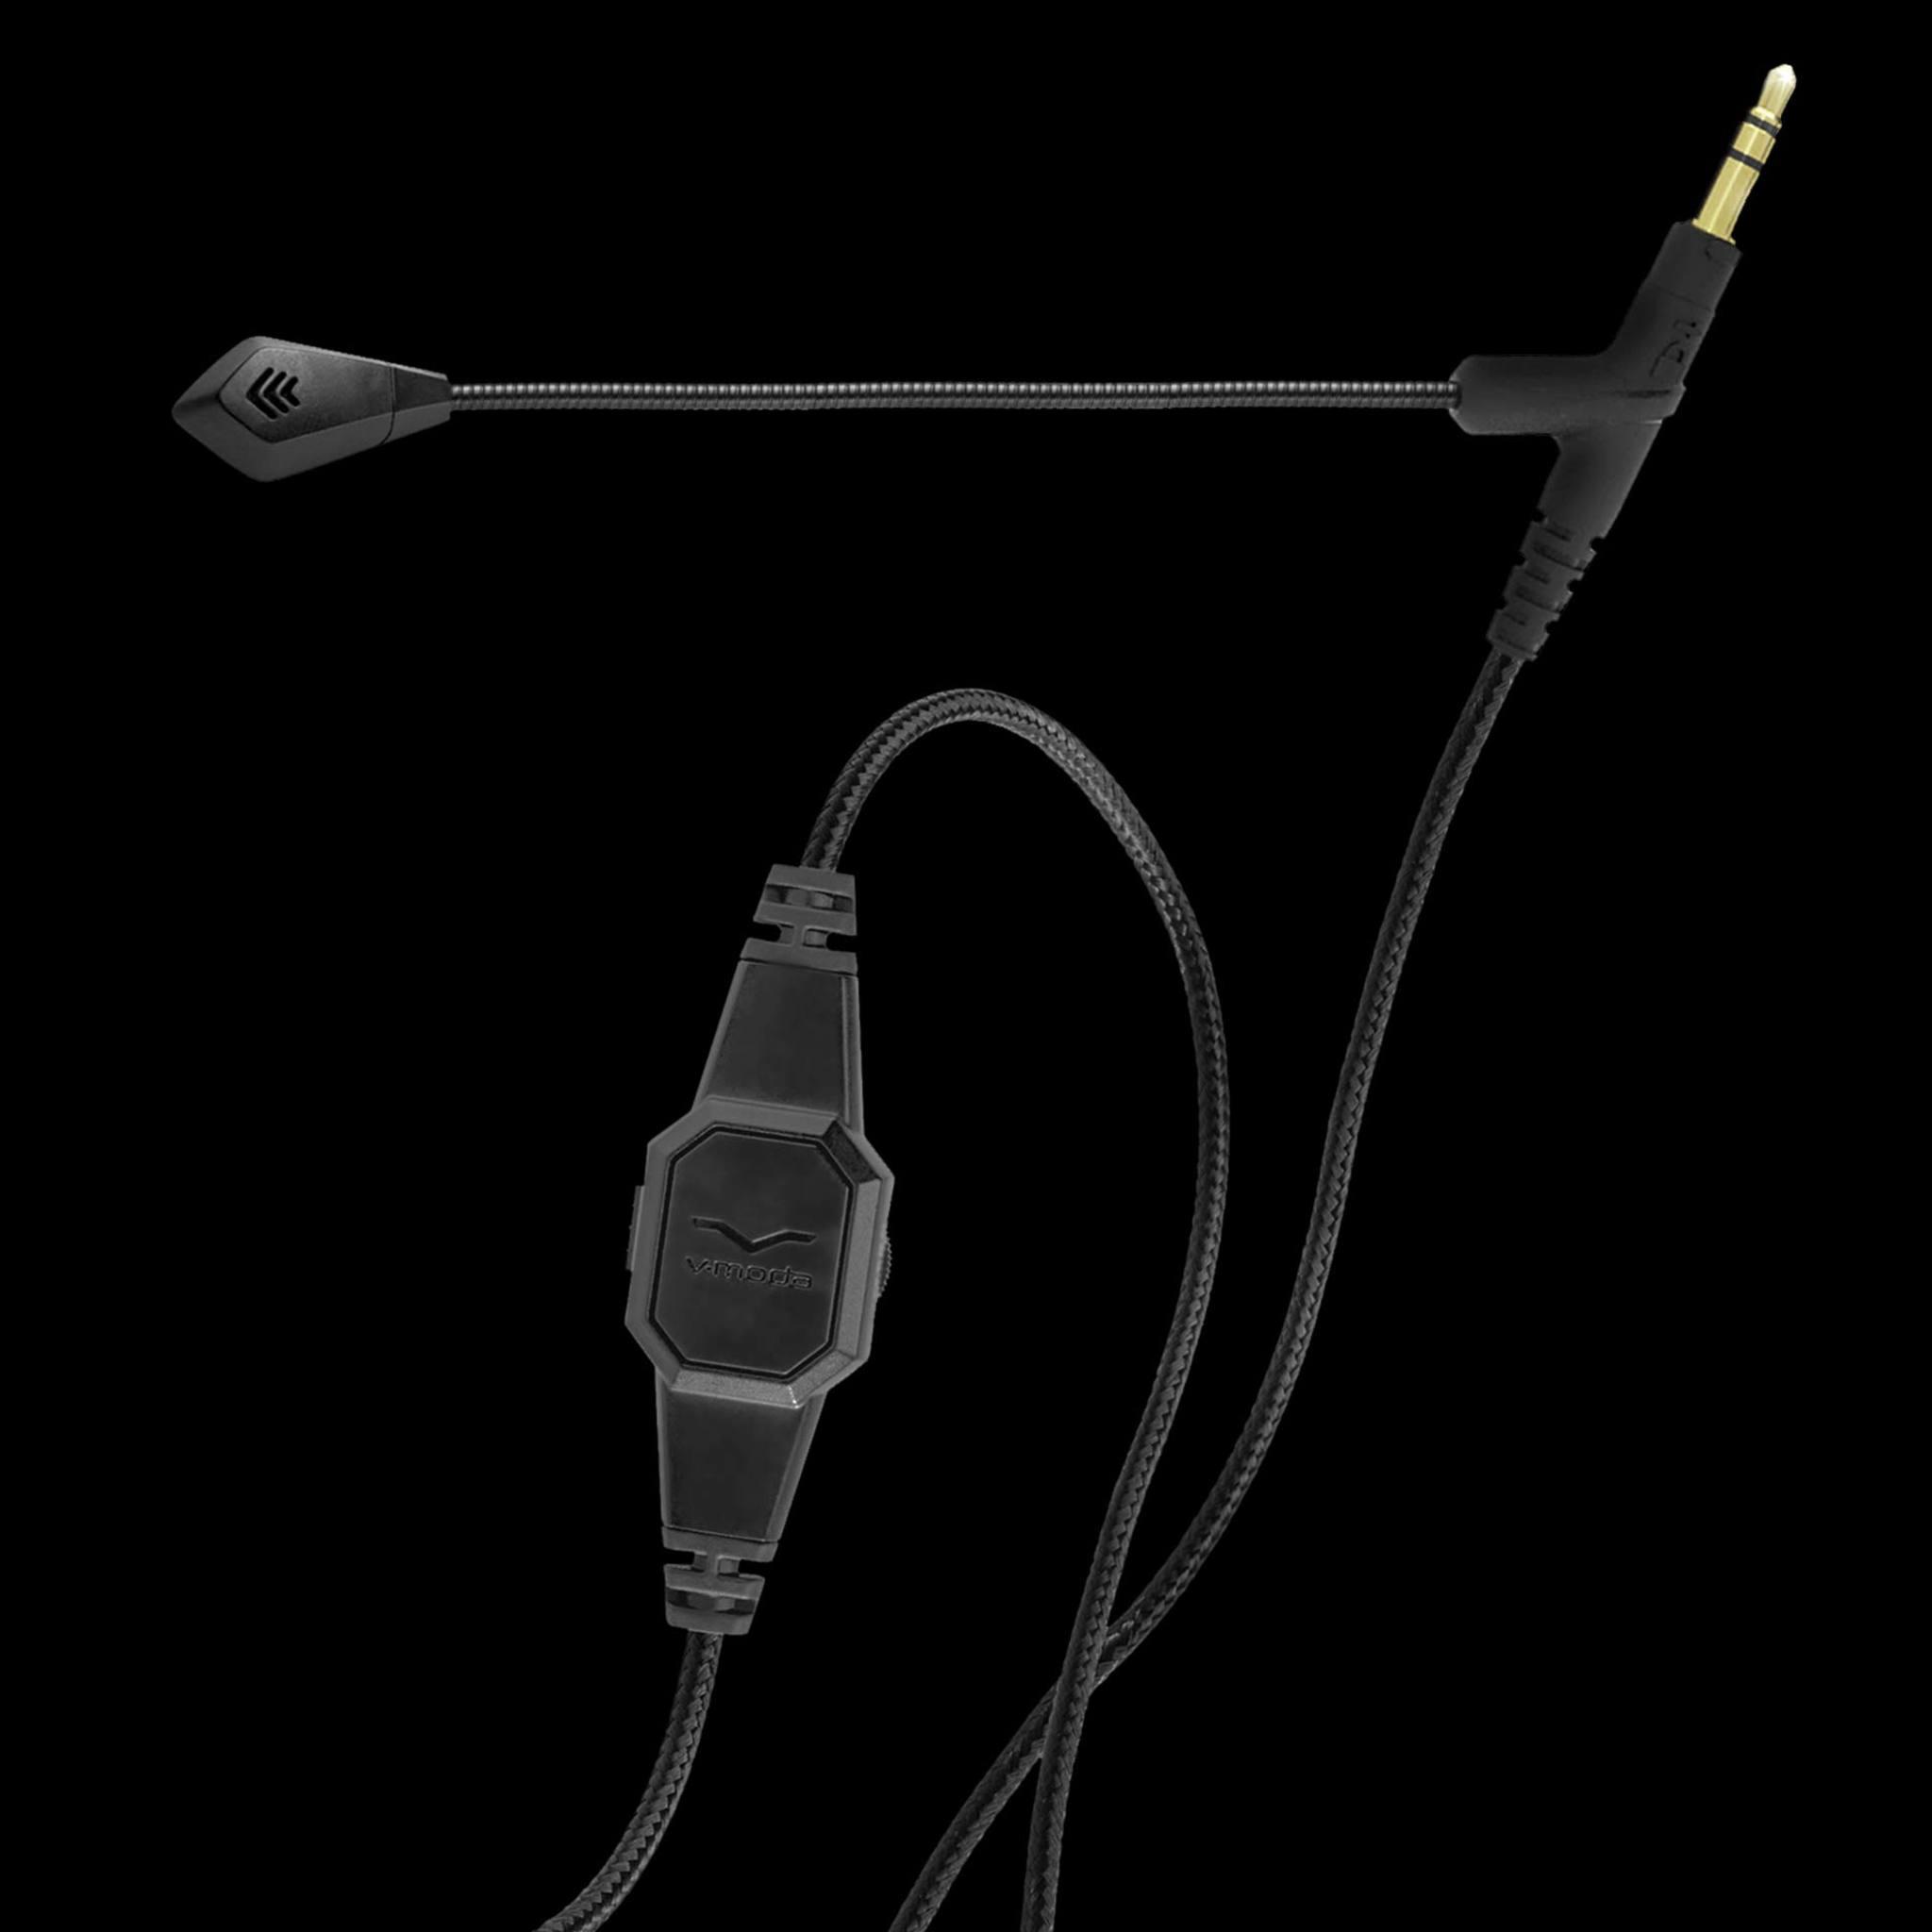 V-MODA | BoomPro Microphone | Accessories